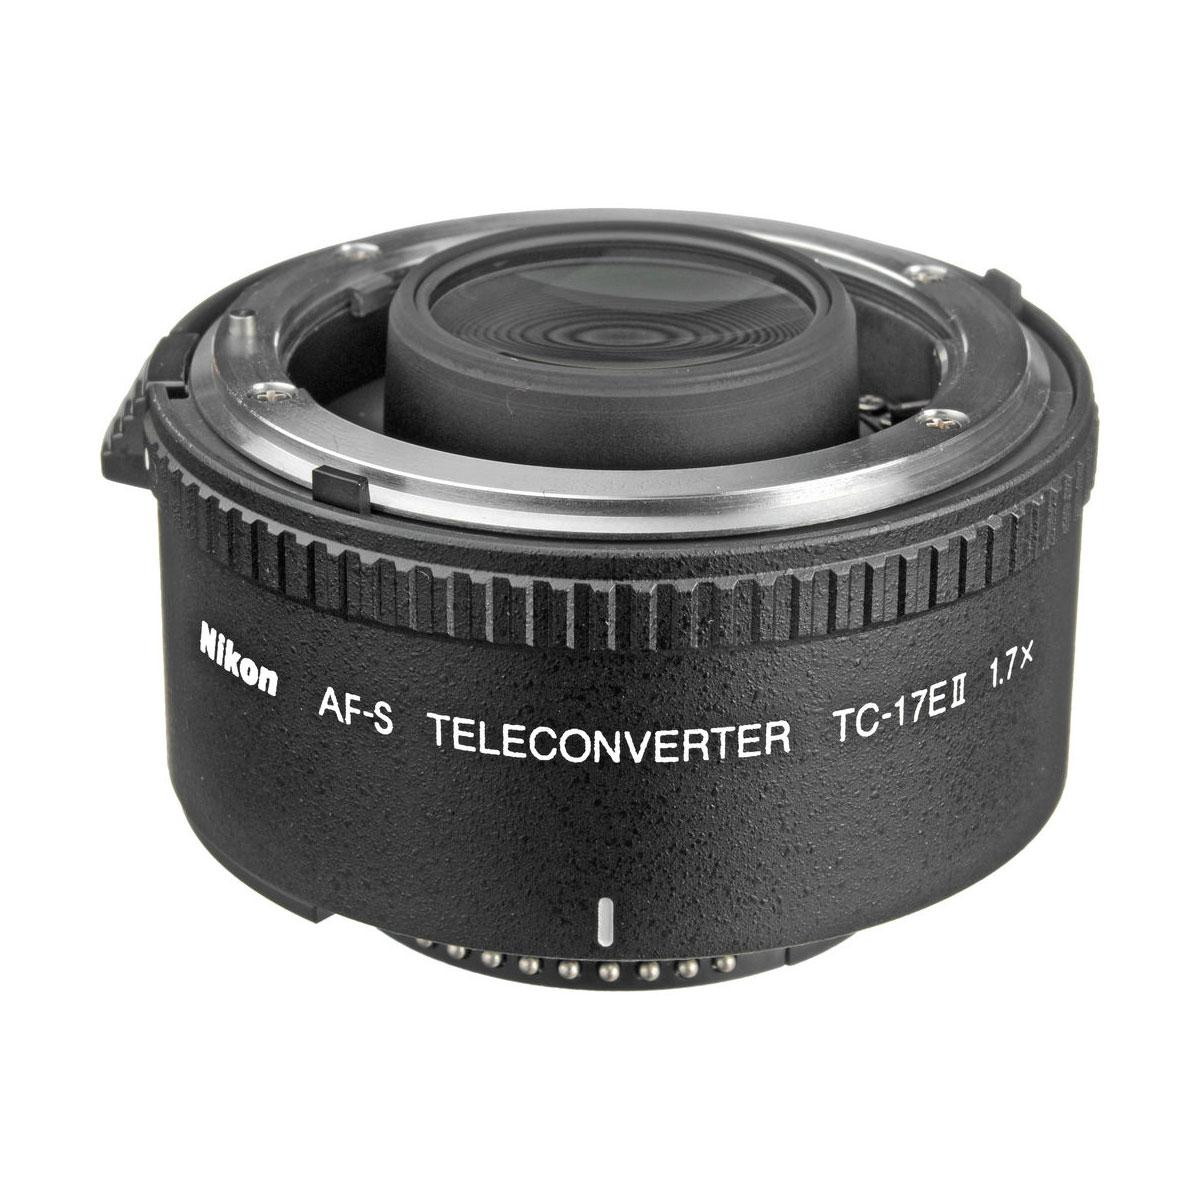 Nikon AF-S Teleconverter TC-17E II – Telejatke